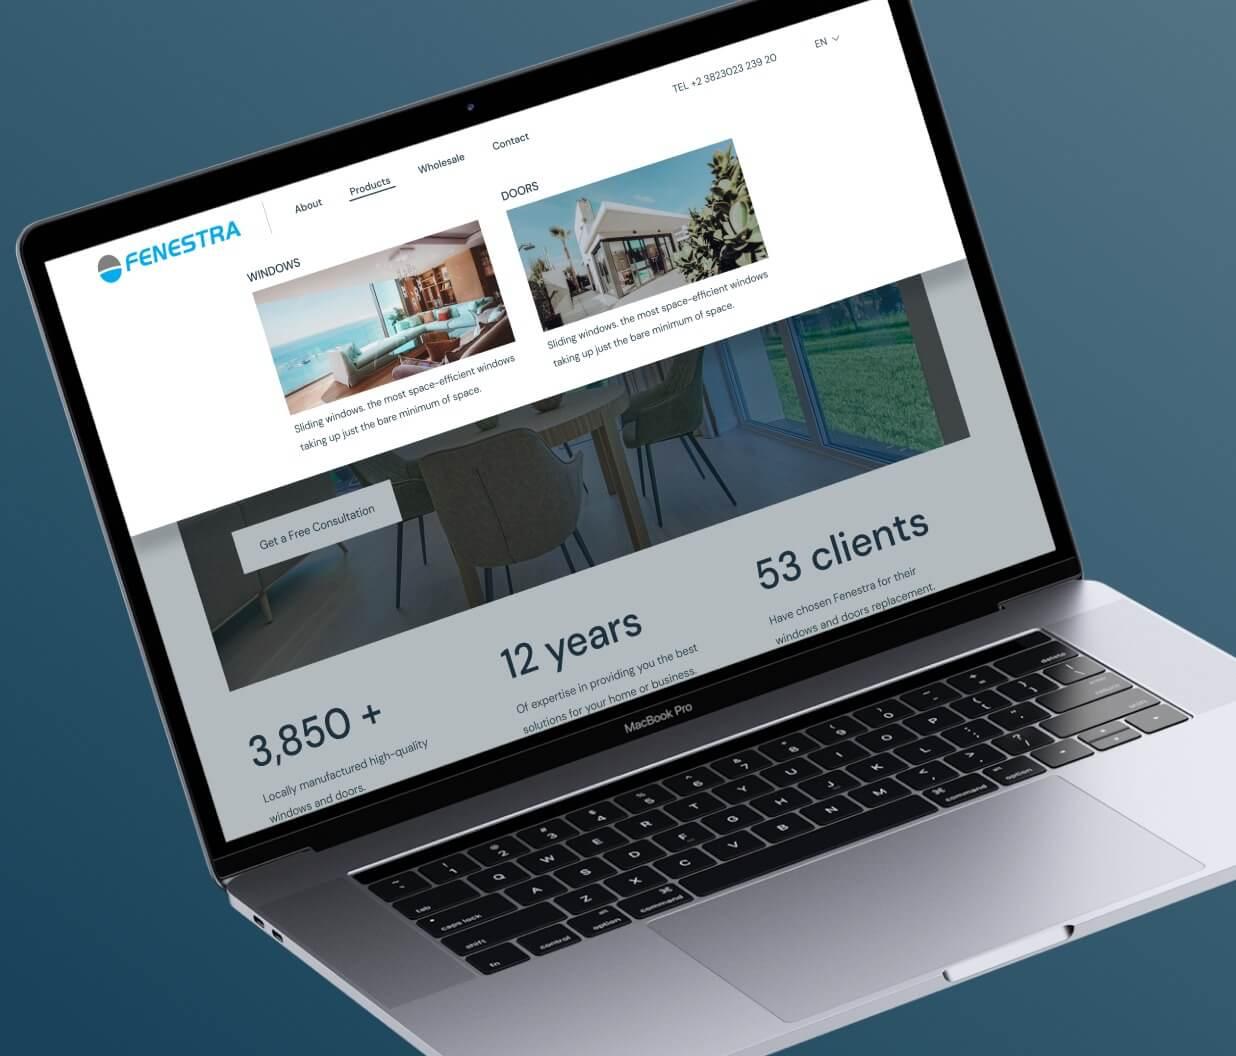 A view of website dropdown navigation menu.